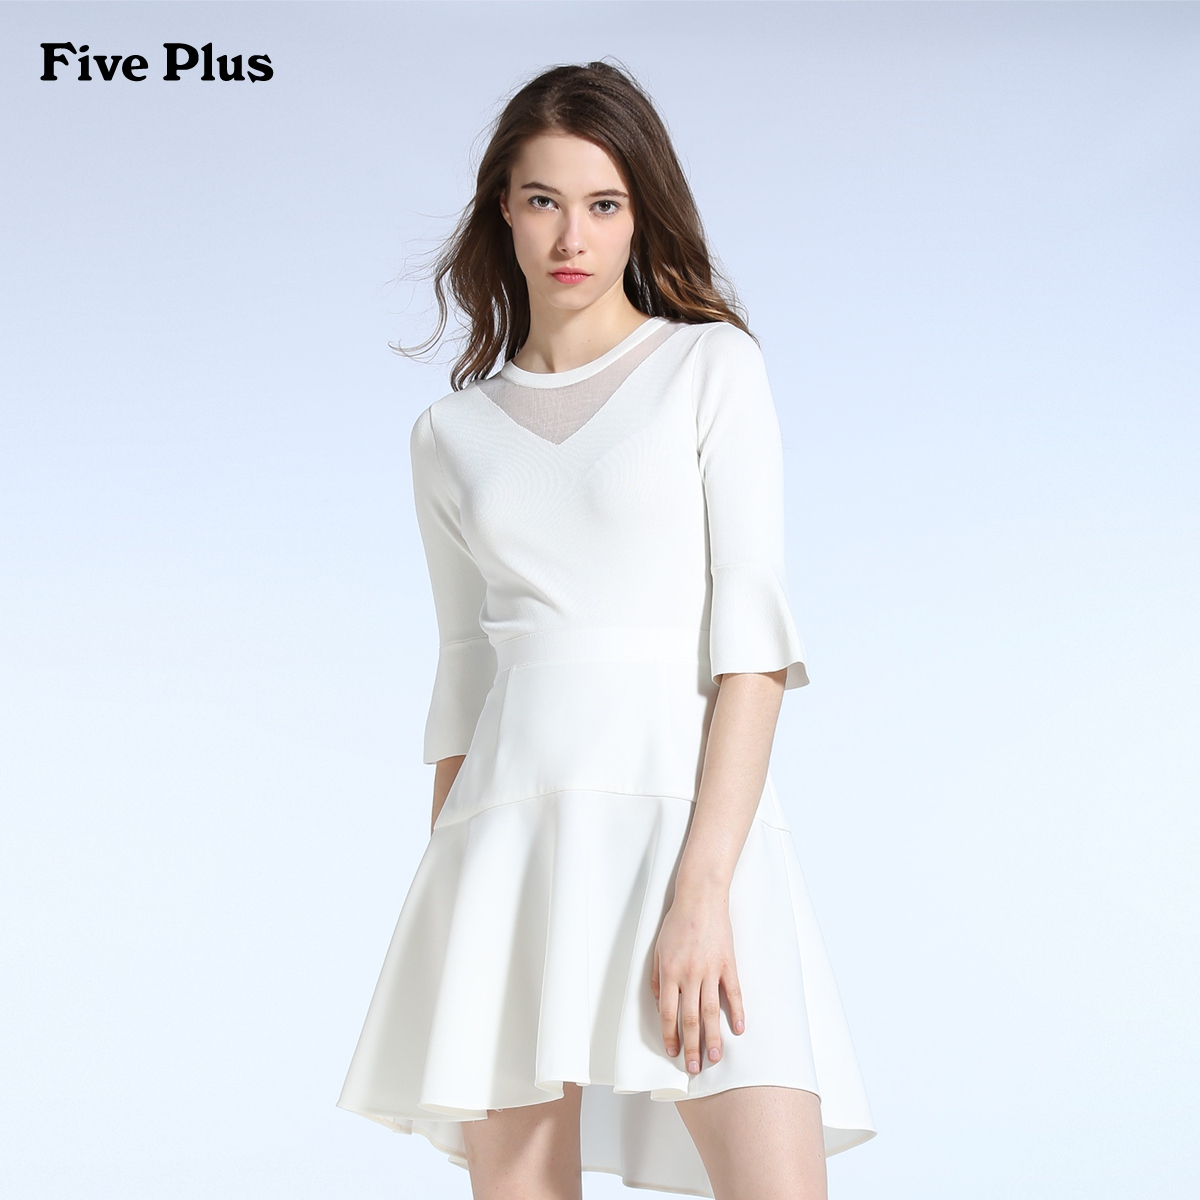 Five Plus新女夏装纯色拼接中腰喇叭袖连衣裙鱼尾裙2JM2083350